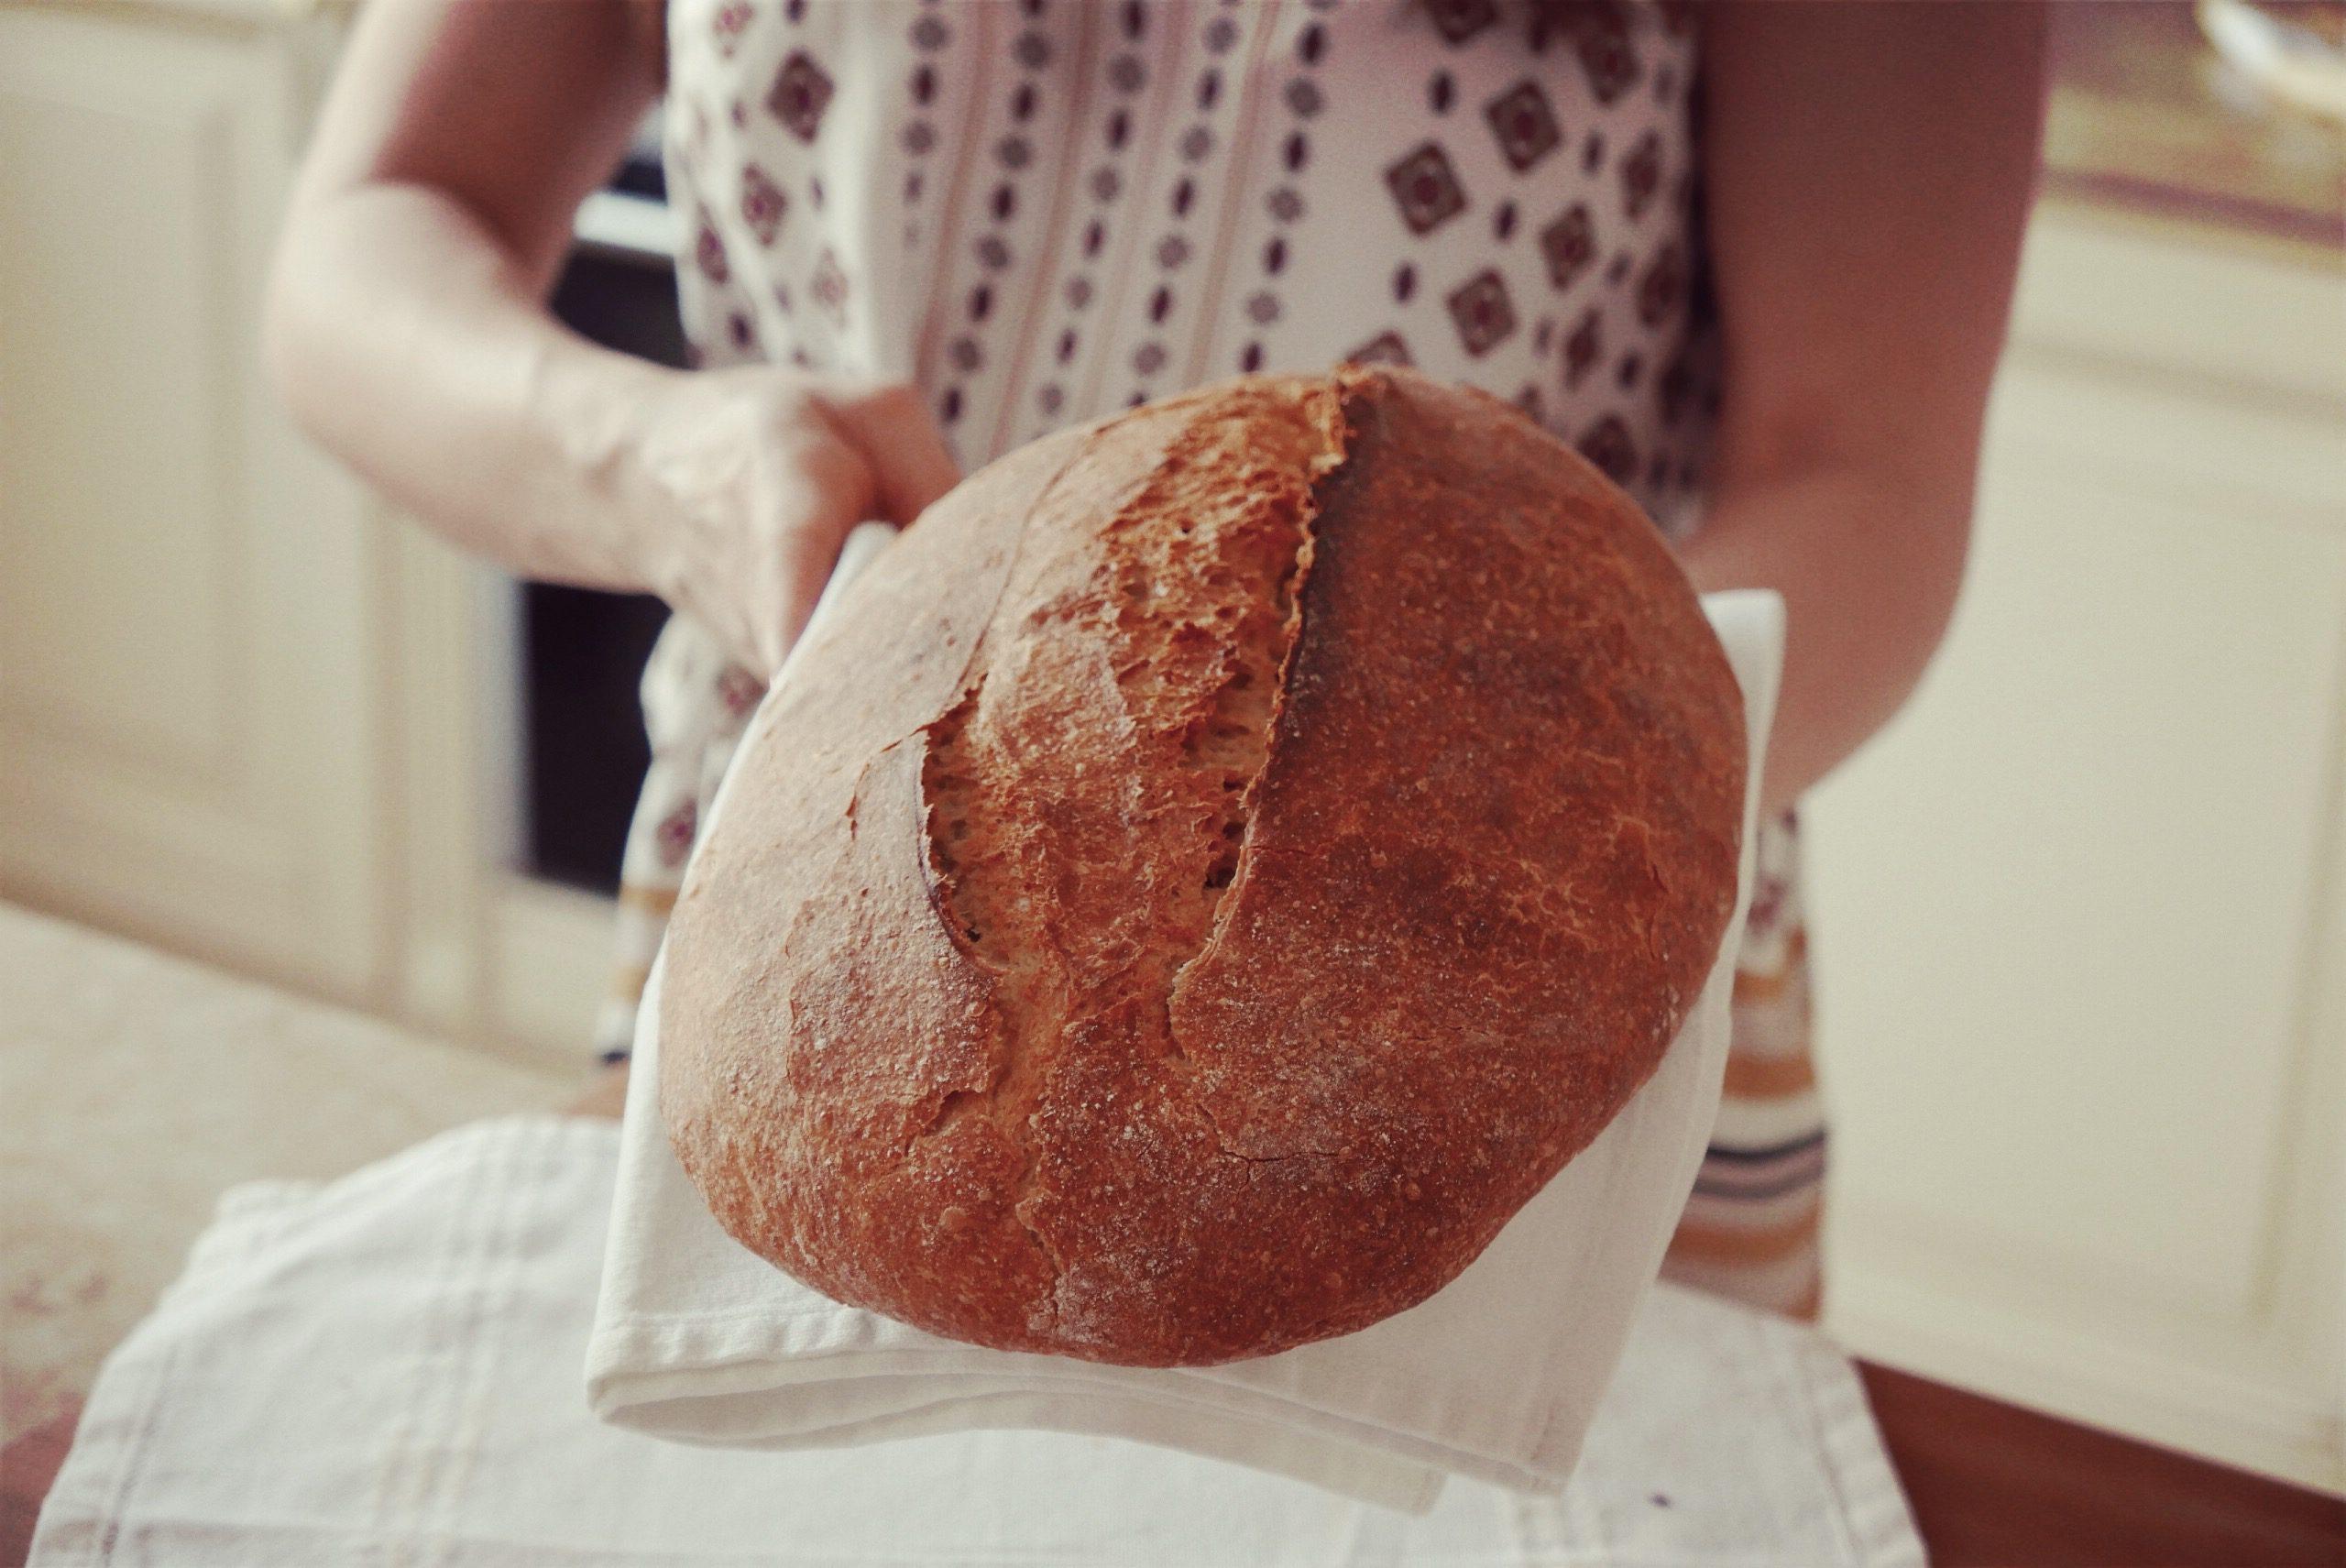 Mindennapi kenyerünket…